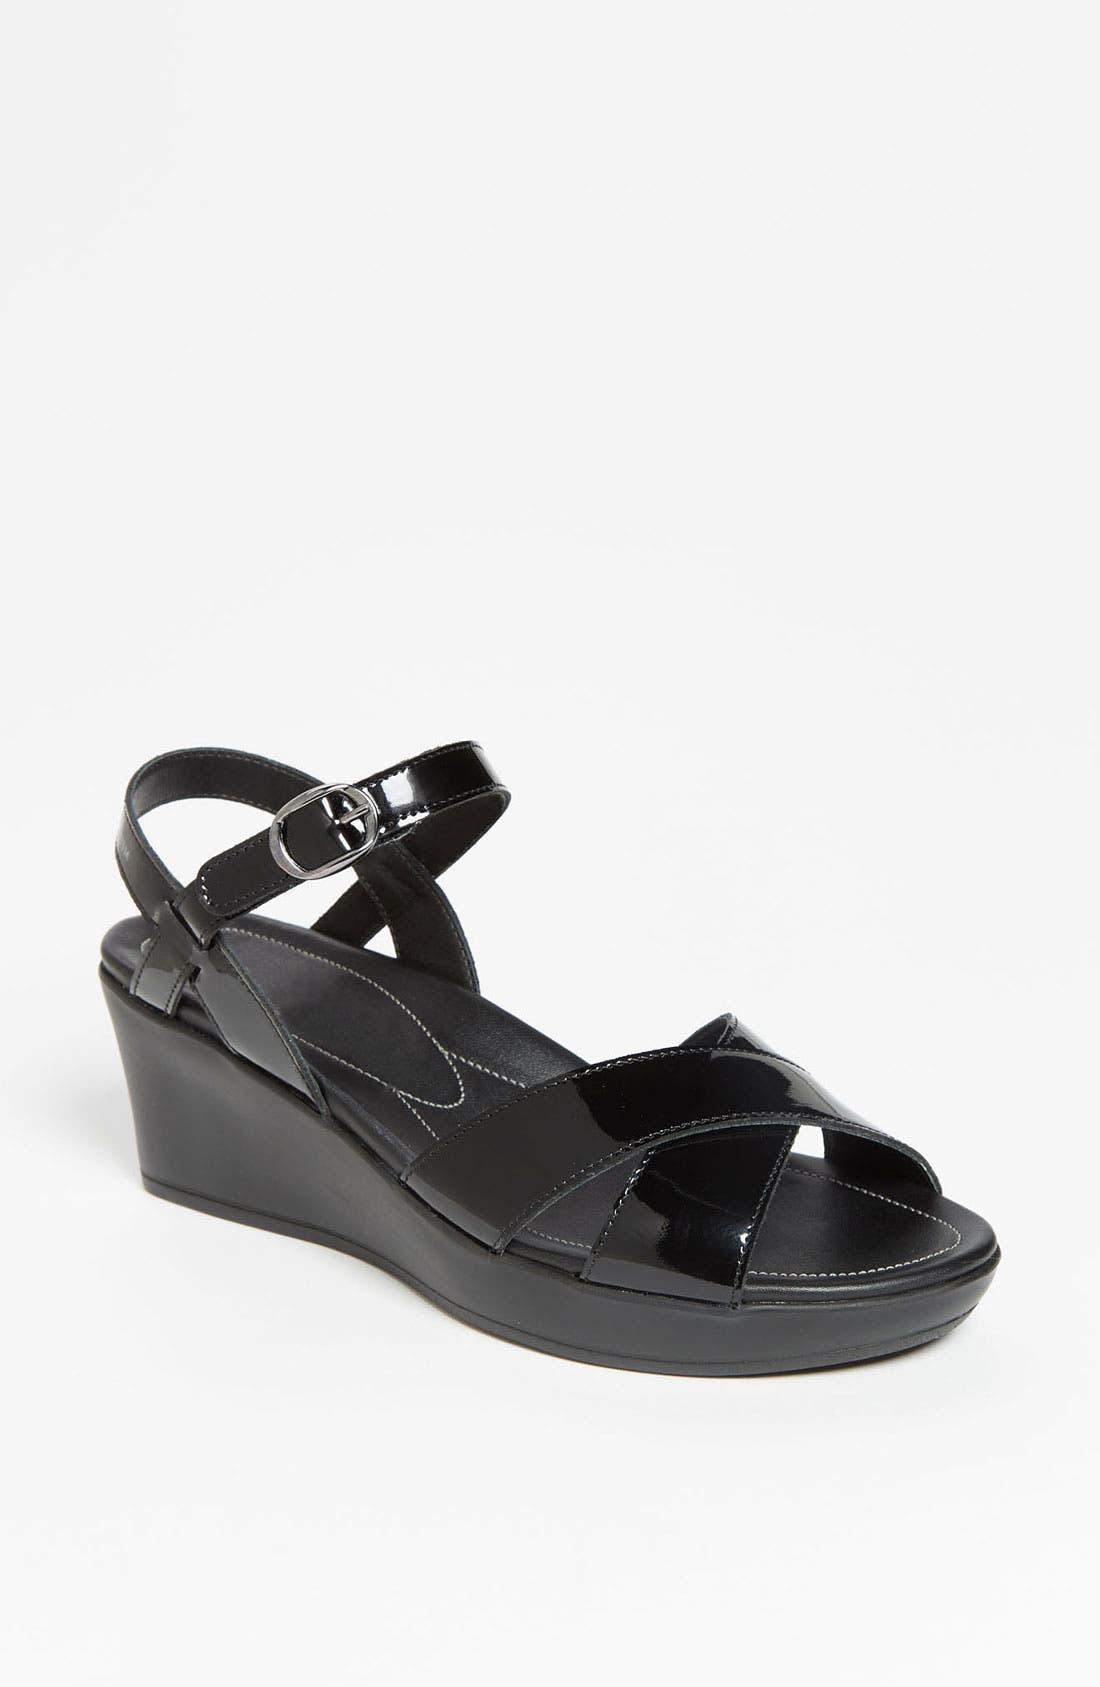 Main Image - Mephisto 'Partelia' Sandal